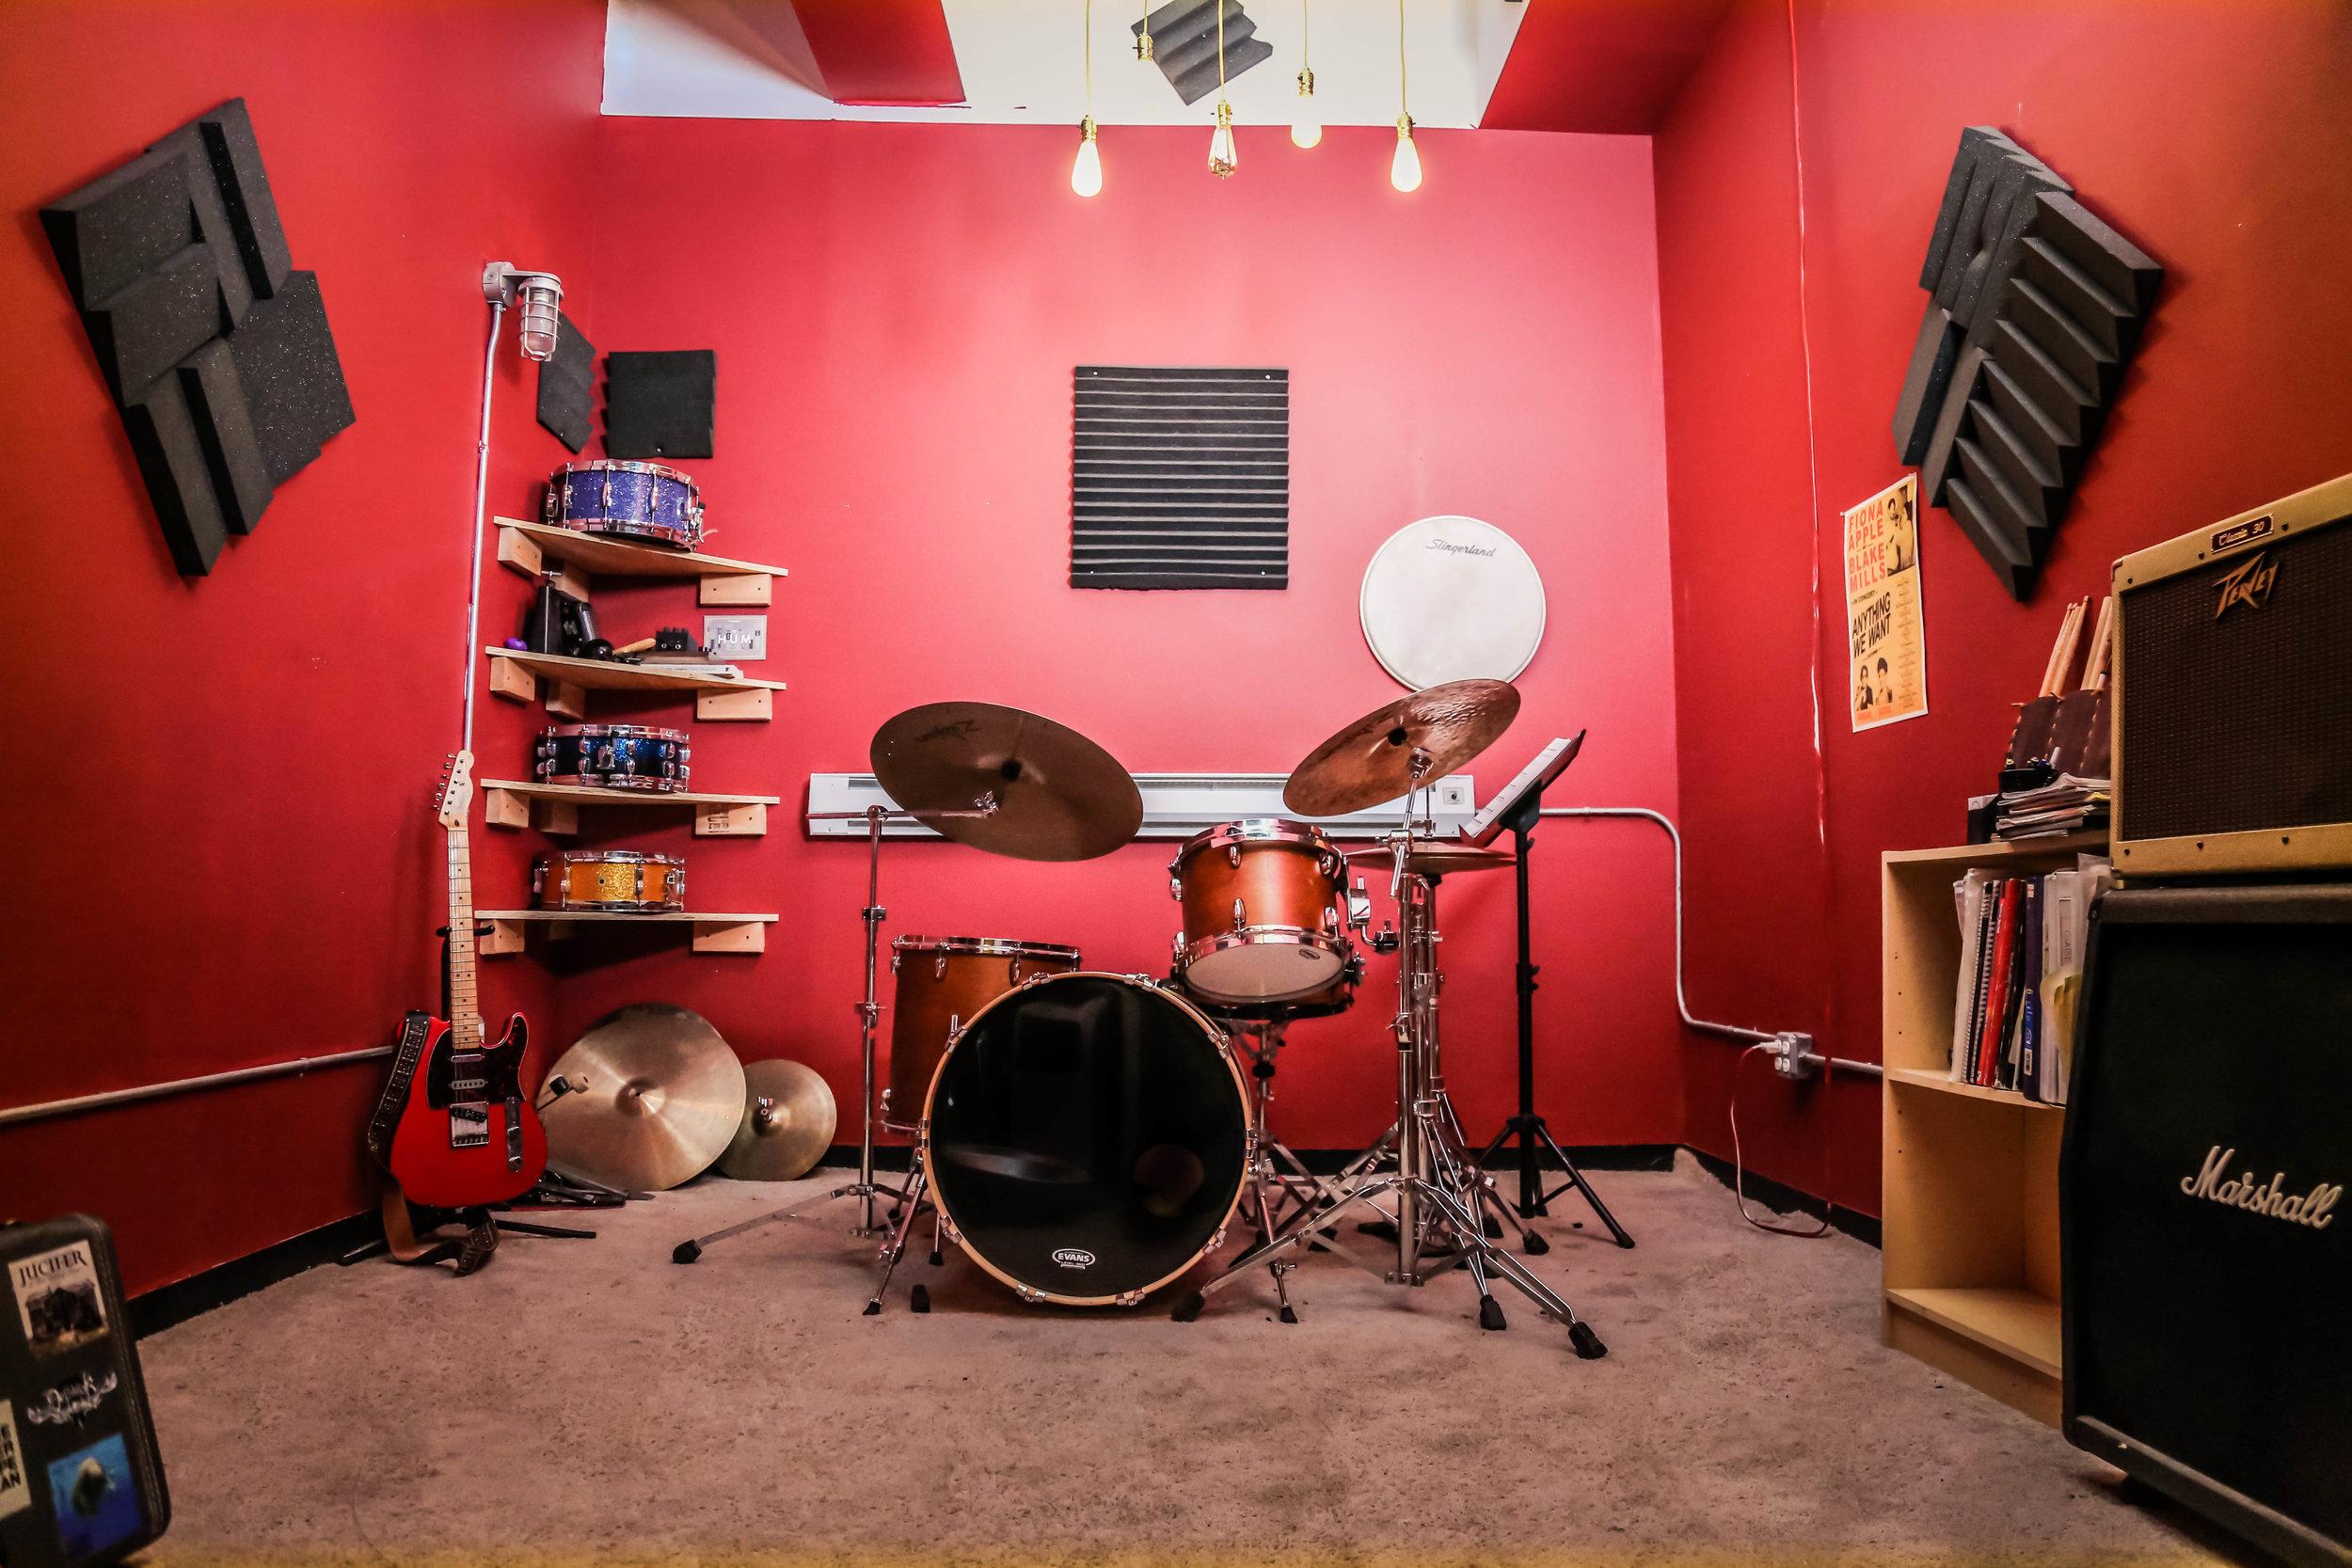 Chris Miller studio portraid cropped.JPG